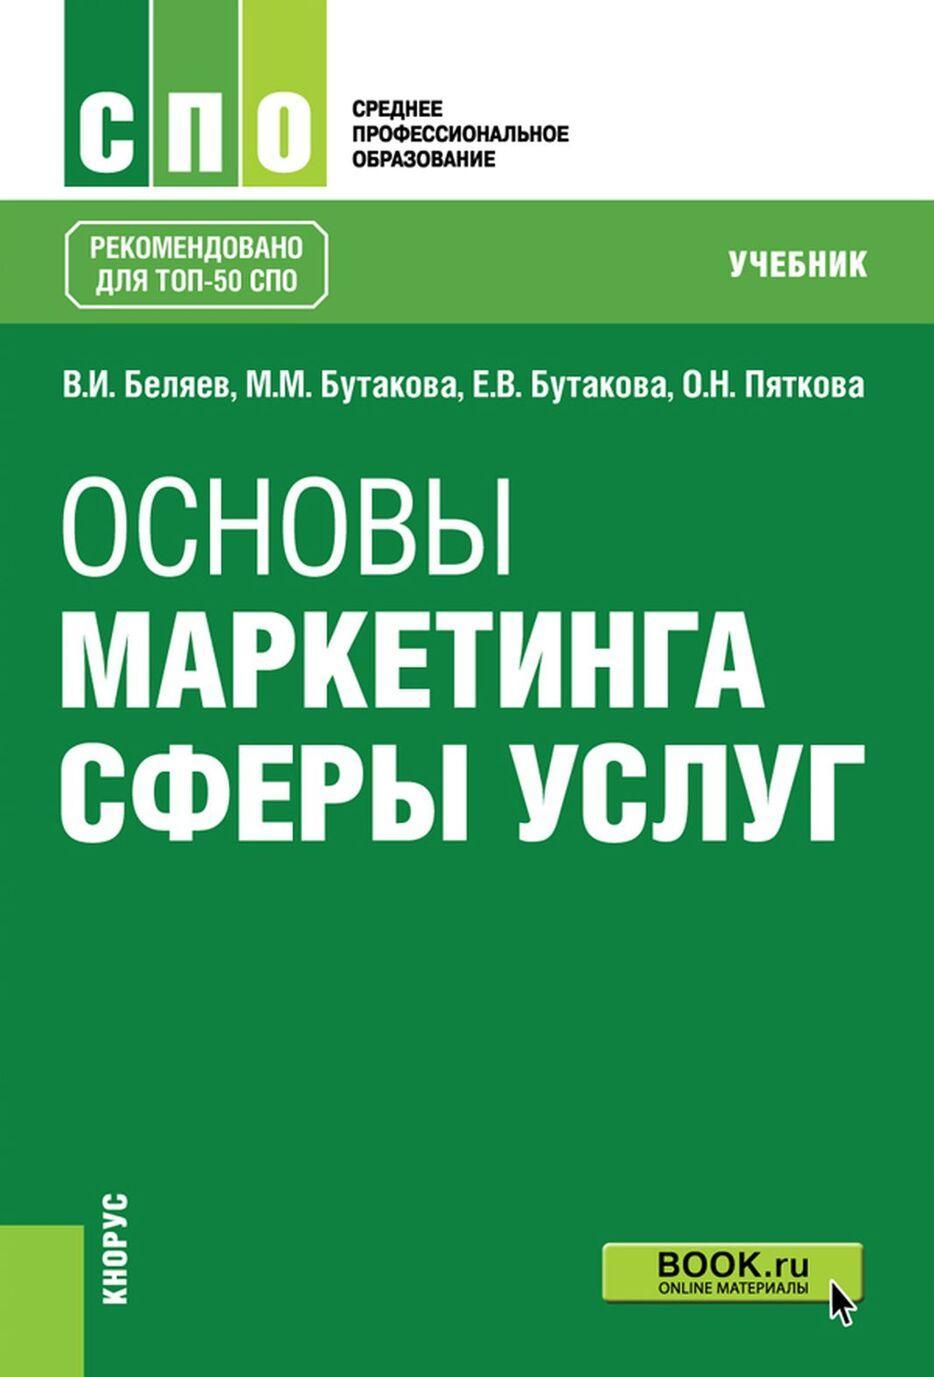 Osnovy marketinga sfery uslug. Uchebnik. | Butakova Marina Mikhajlovna, Butakova Elena Viktorovna